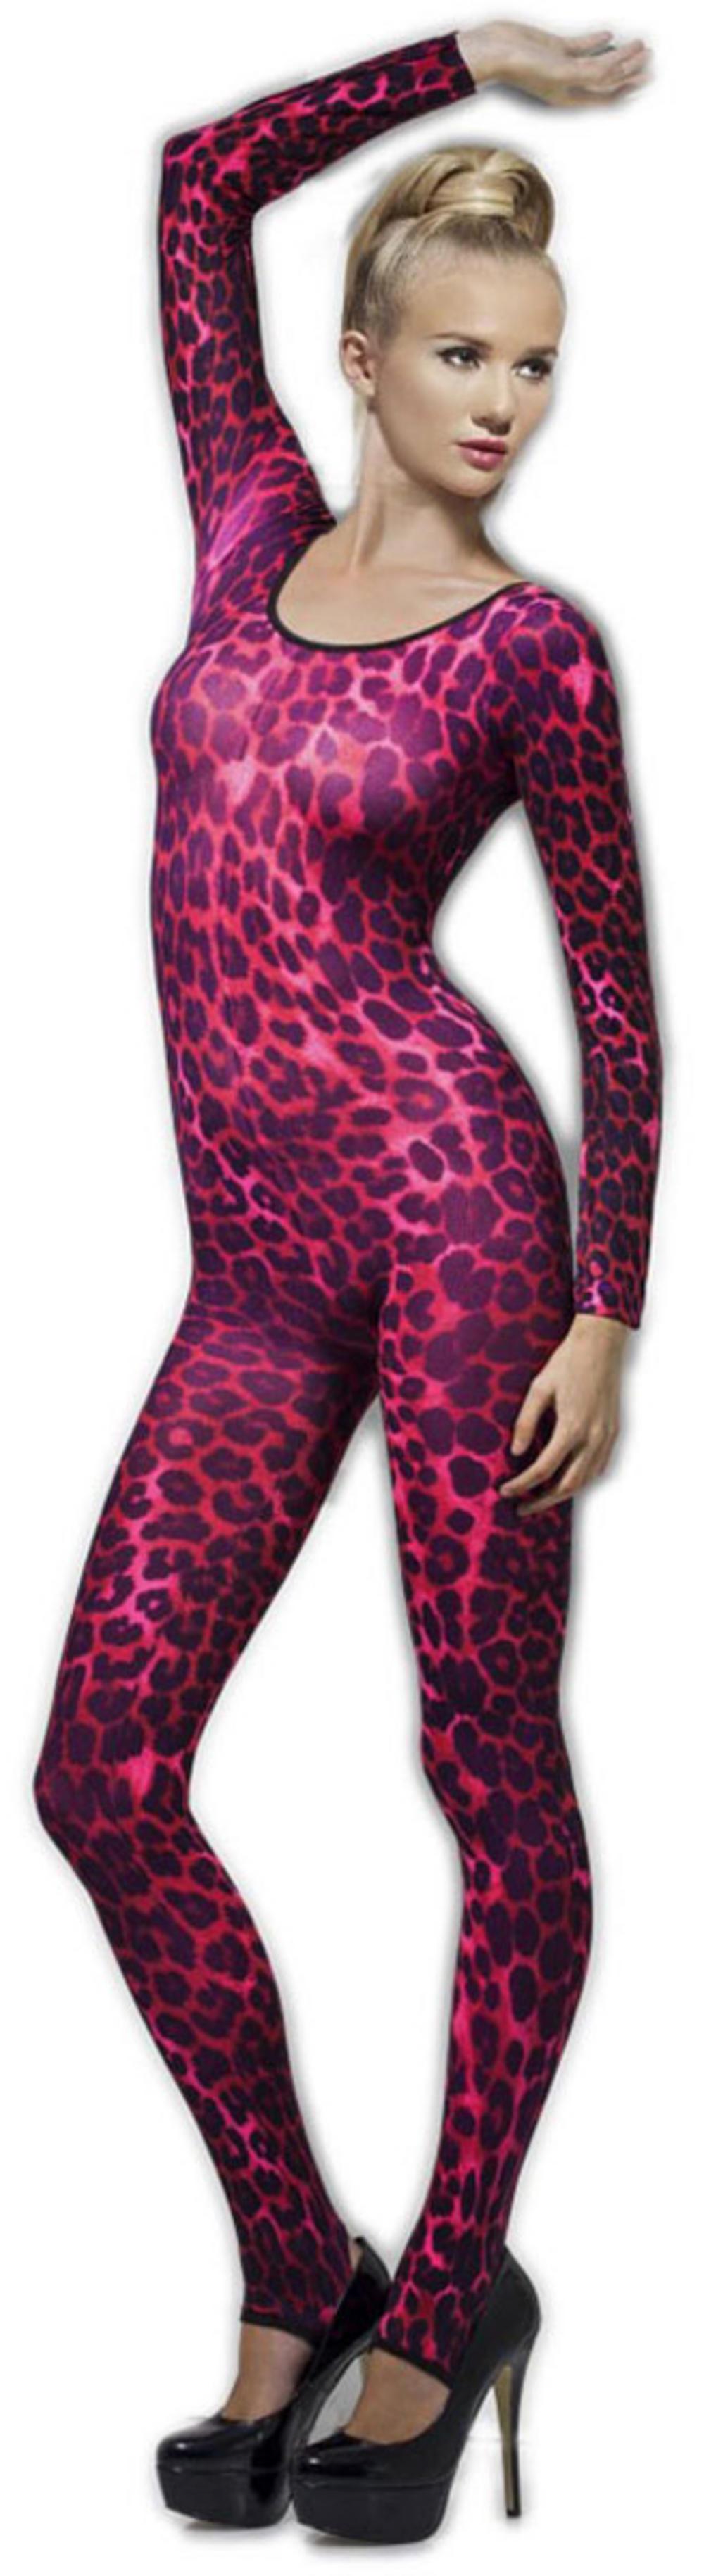 Pink Cheetah Print Bodysuit